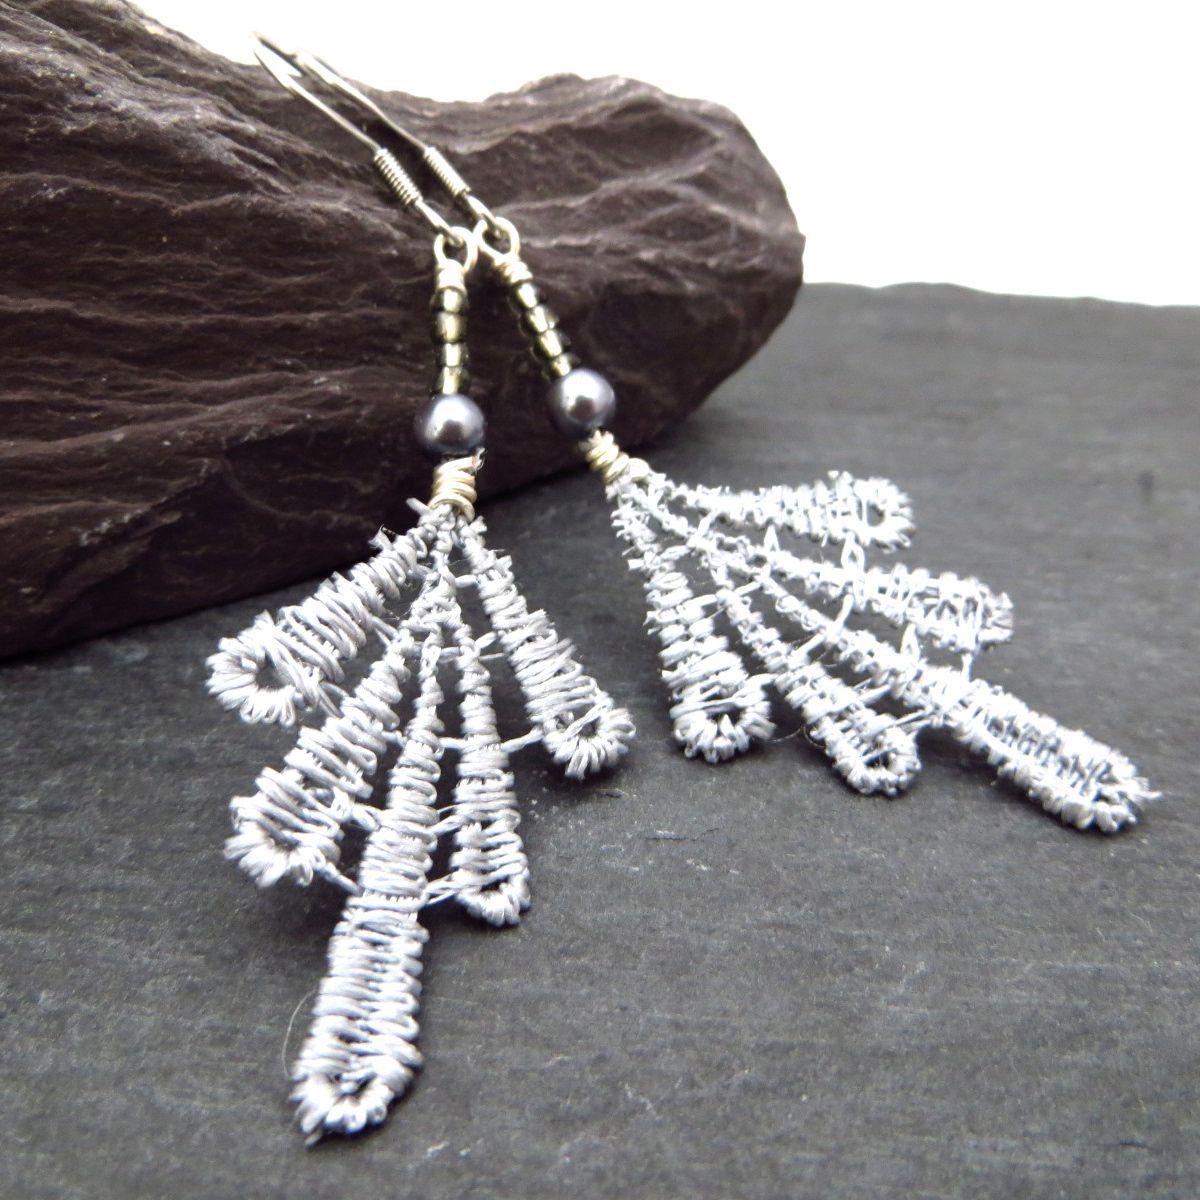 Lace earrings with Swarovski pearl & Czech glass beads